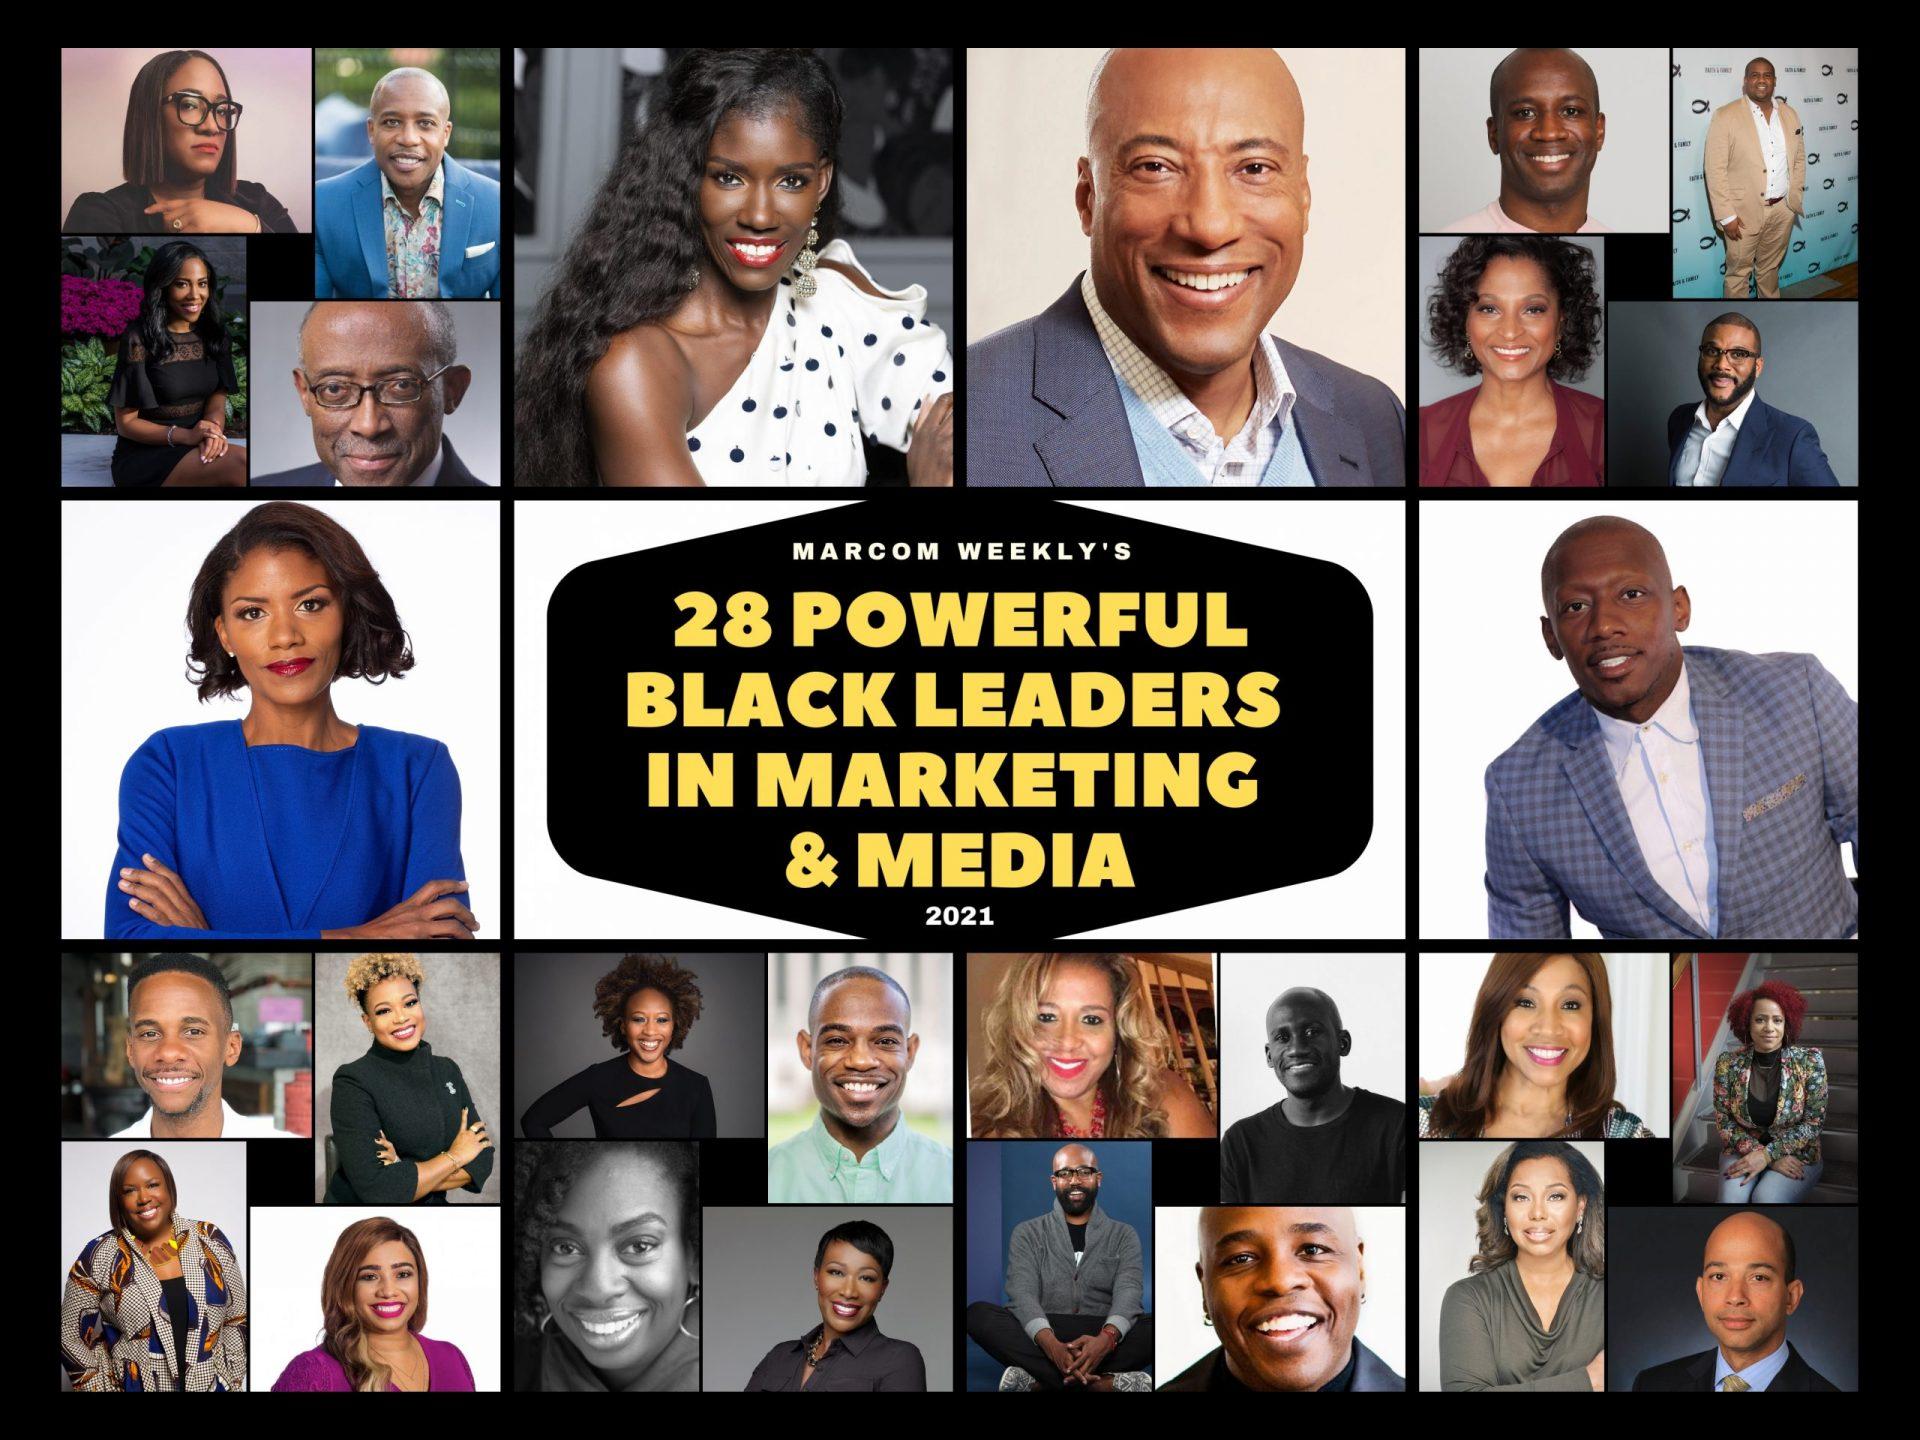 28 powerful Black leaders in marketing and media | Marcom Weekly